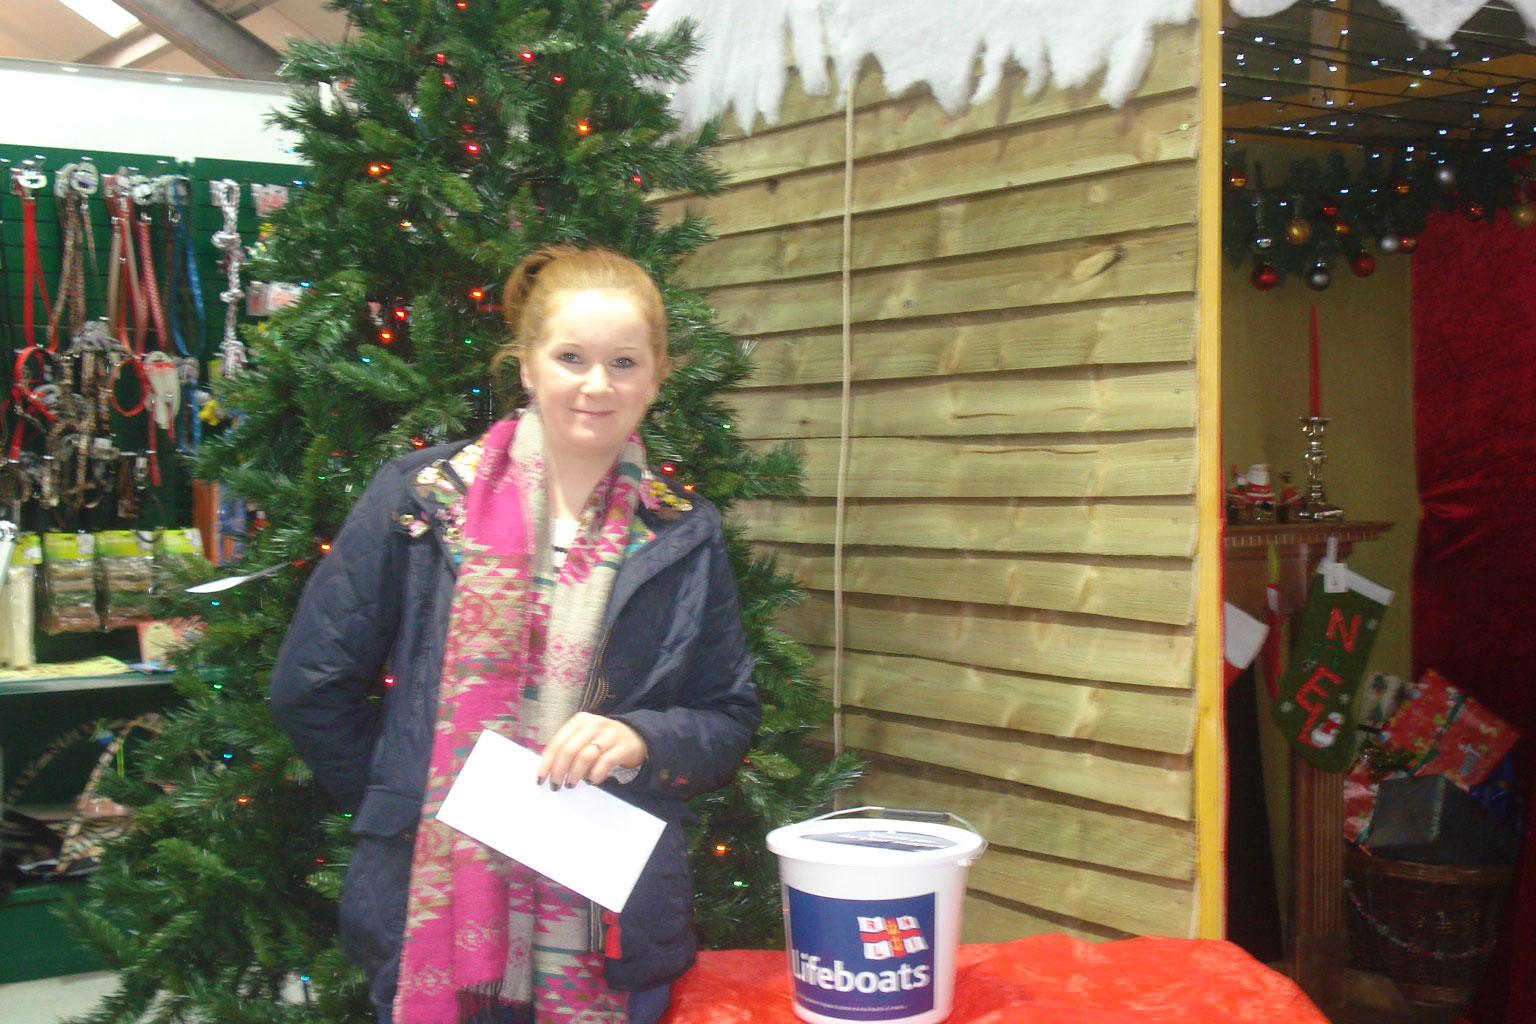 Jennifer with her £100 prize